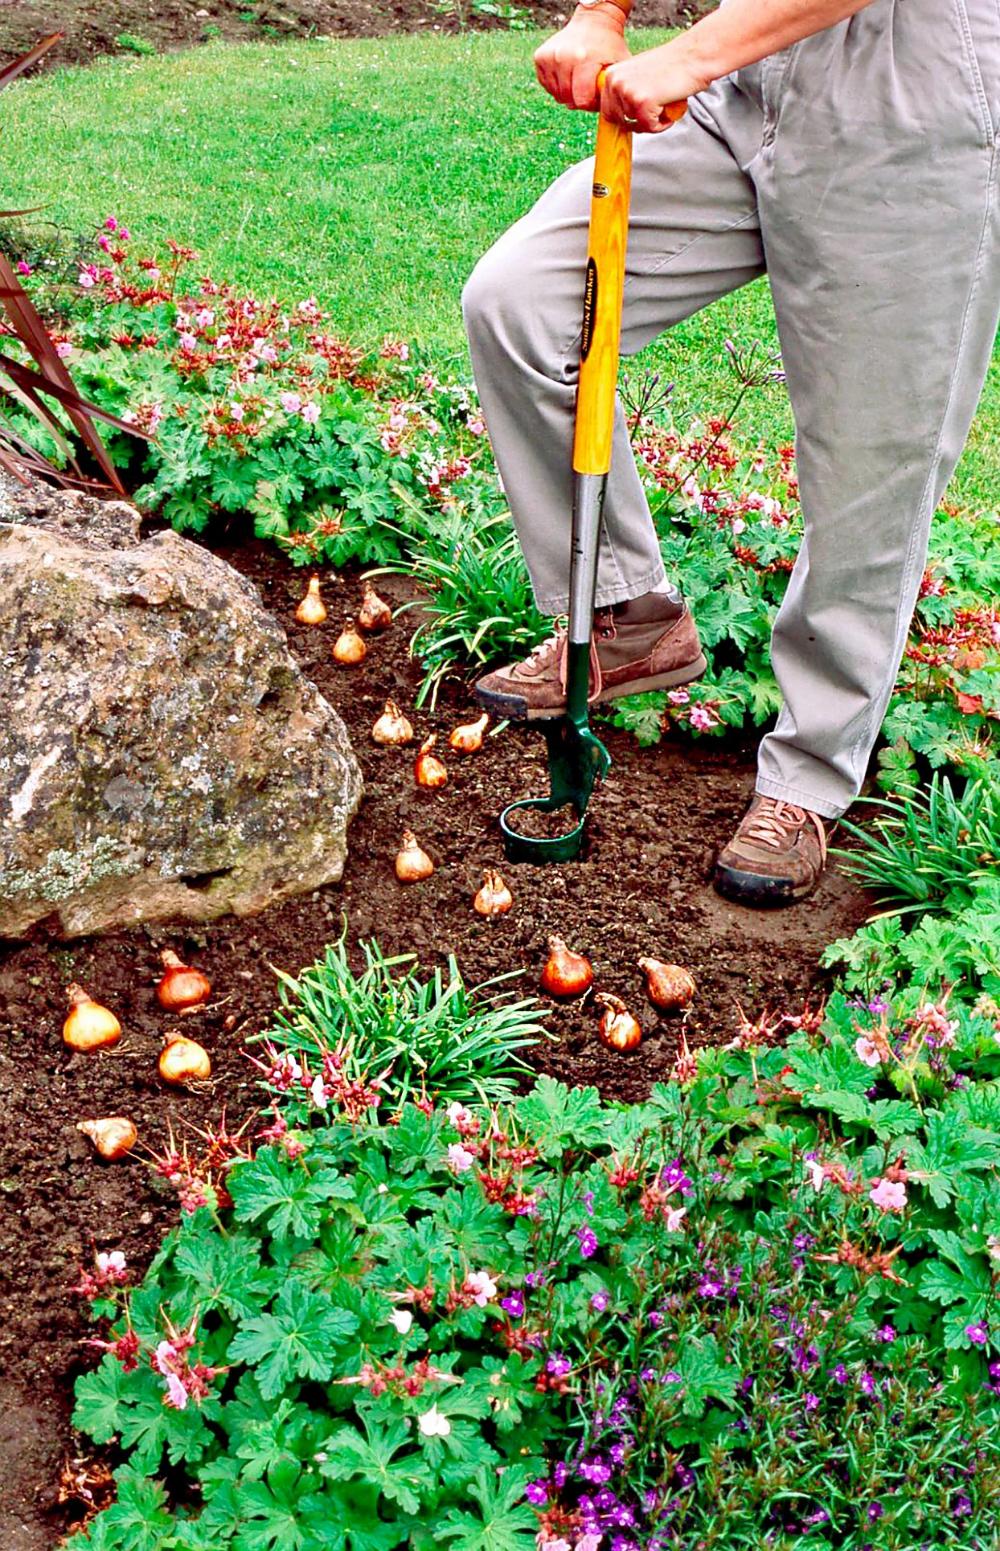 person-garden-tool-plant-bulbs-106f4d55